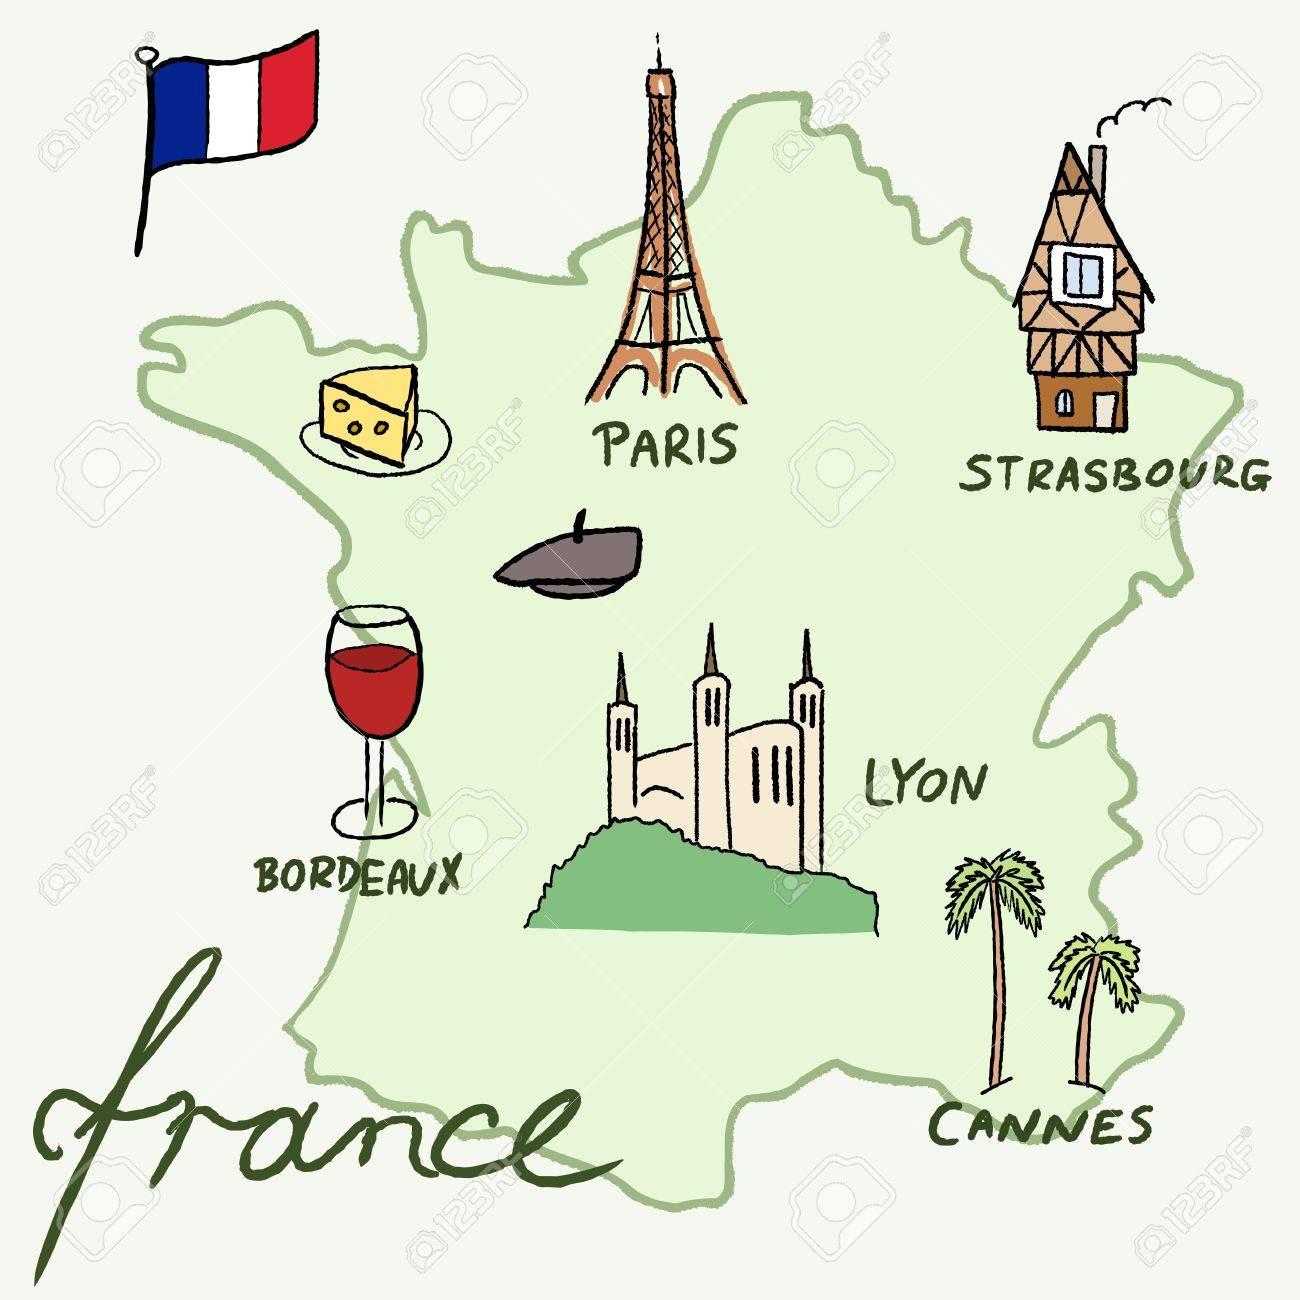 france landmarks vector map paris lyon cannes strasbourg cheese wine